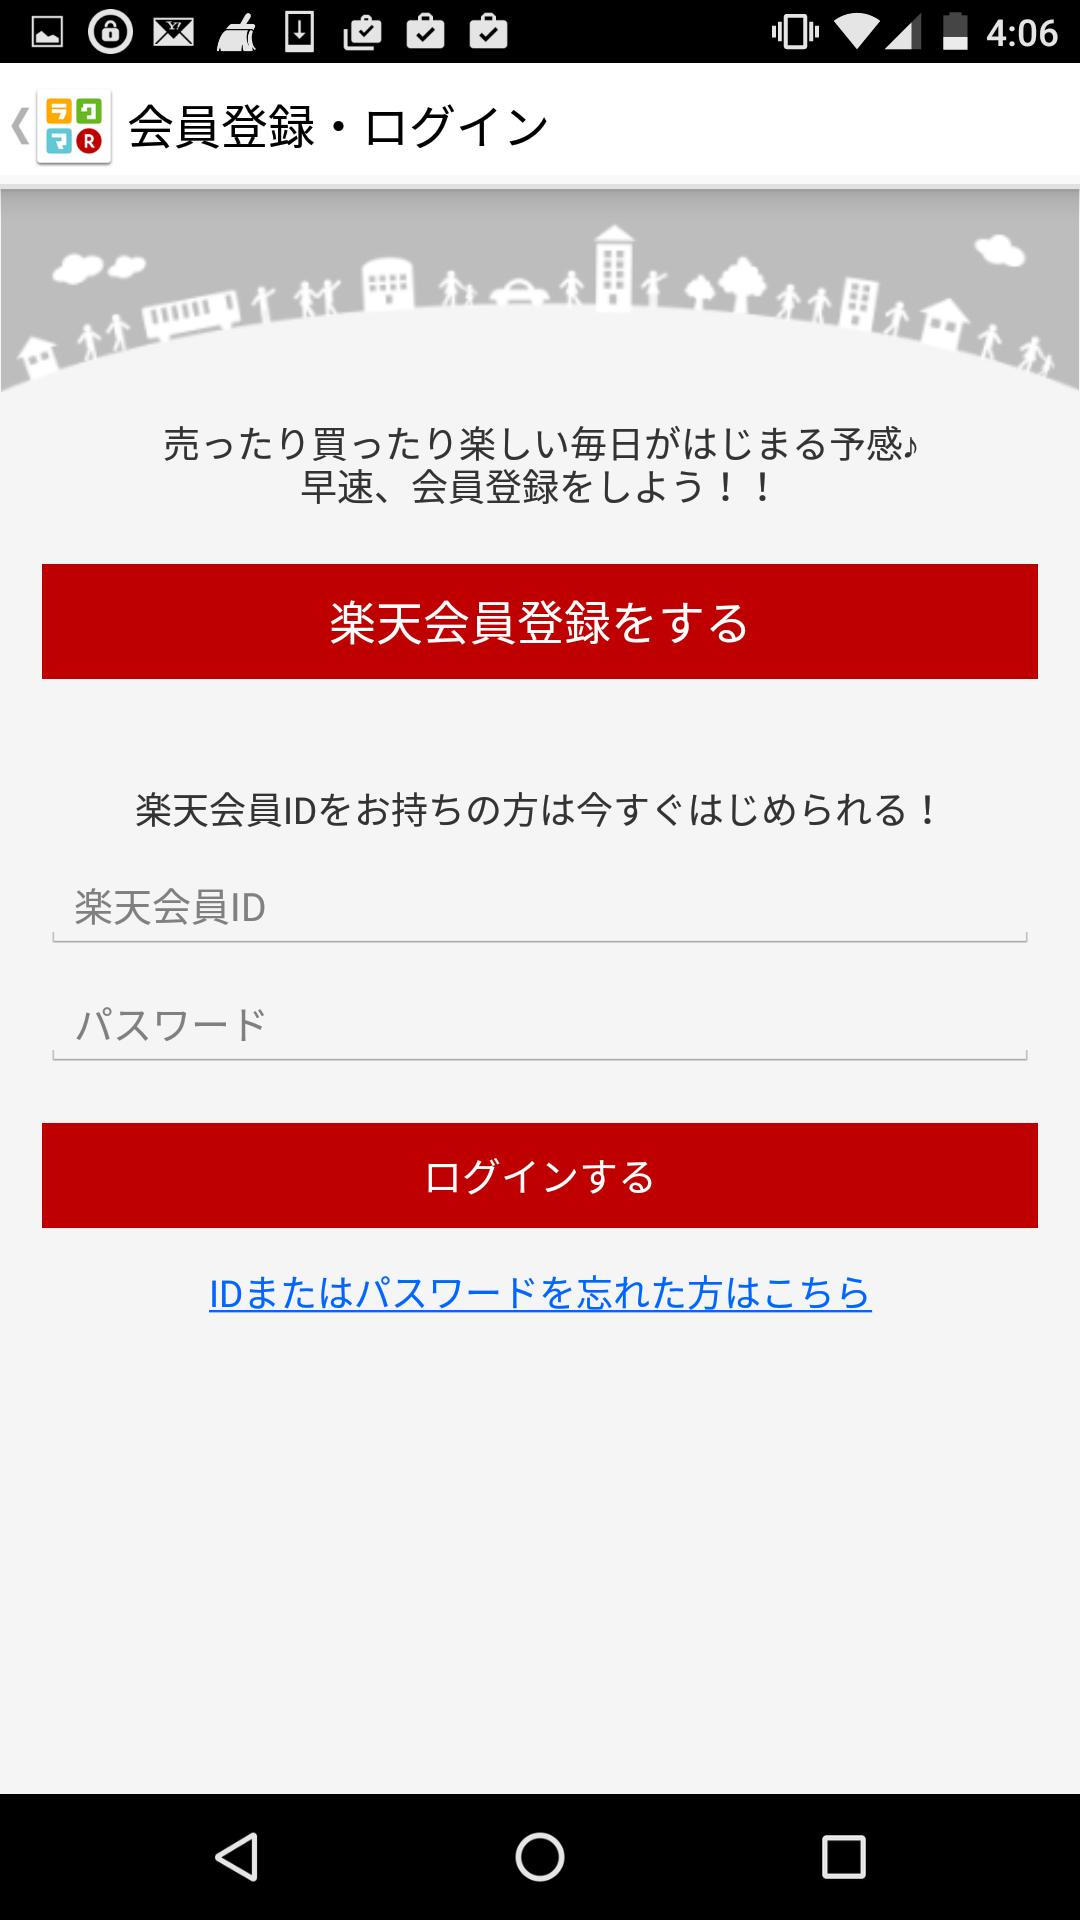 Screenshot_20160916-040602.png